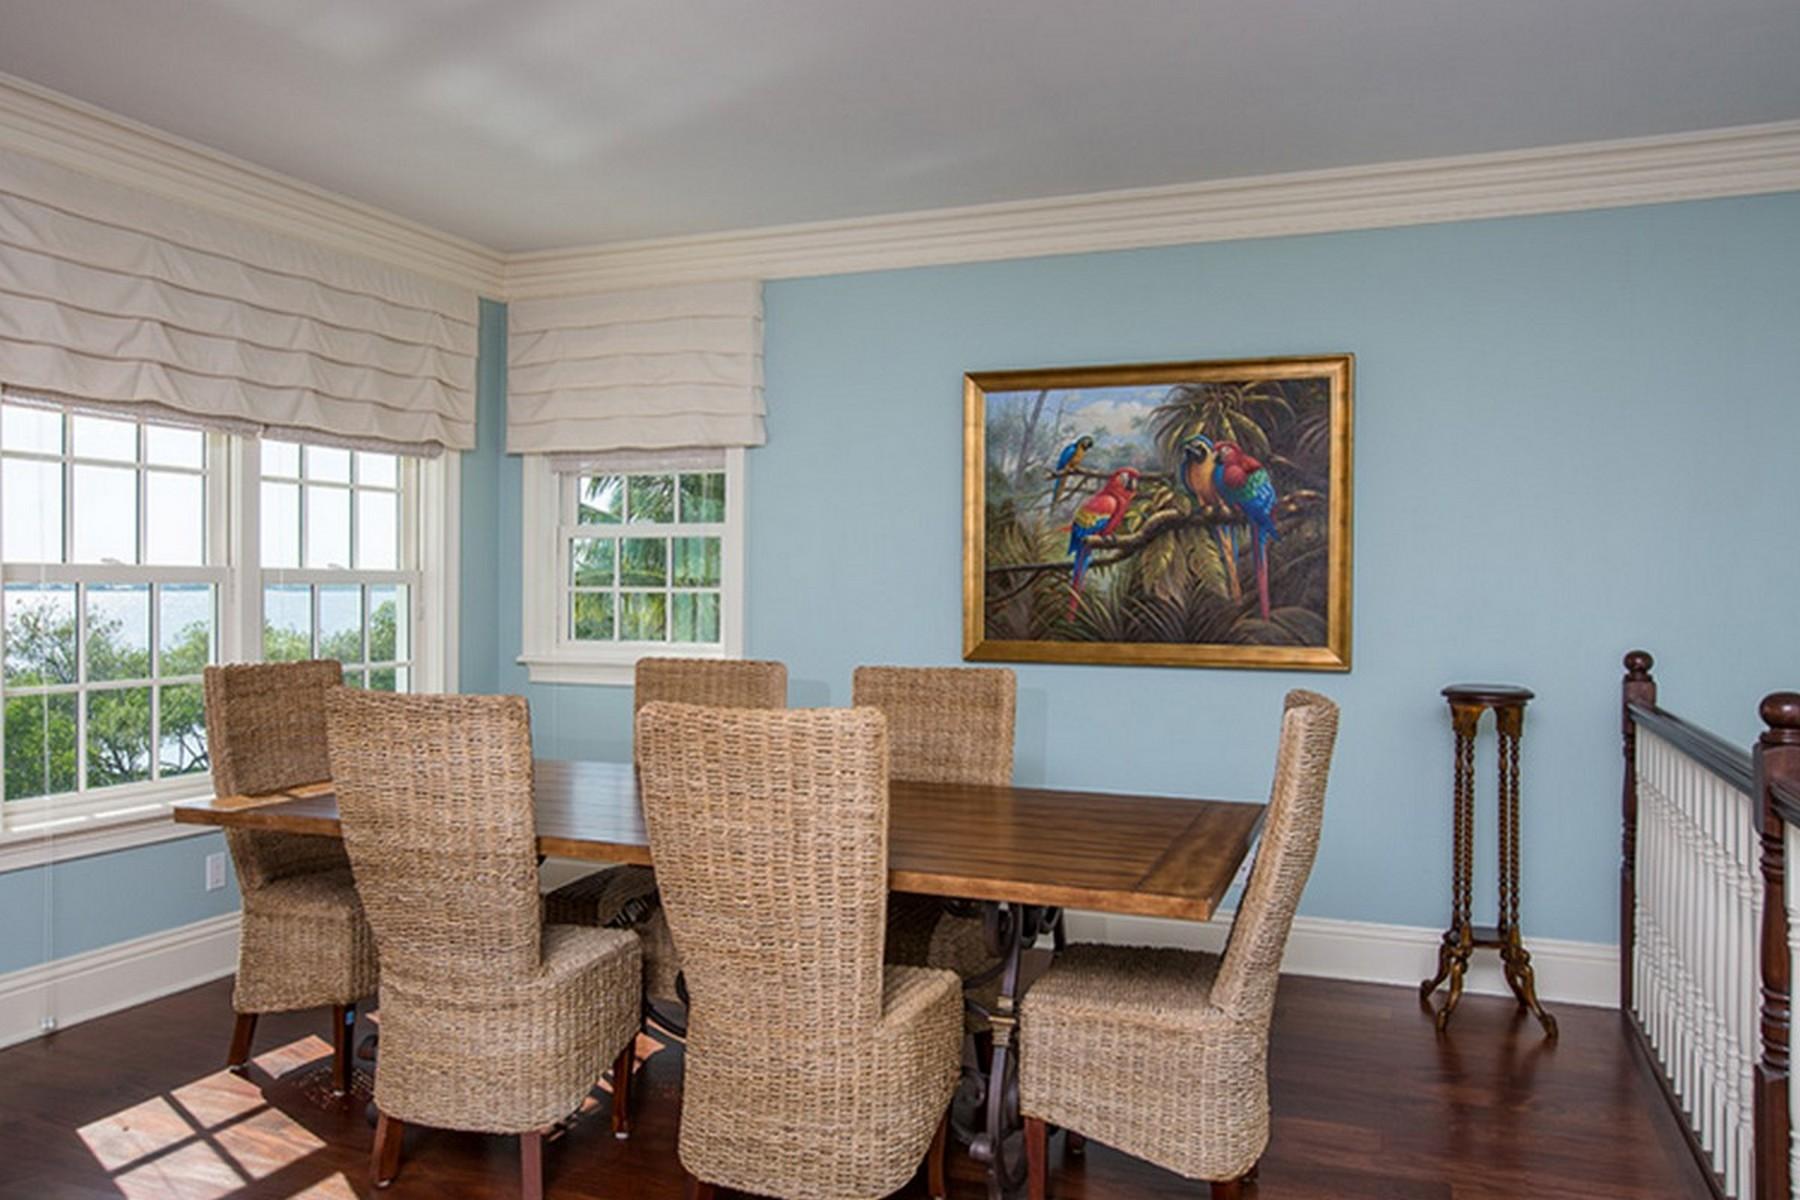 Additional photo for property listing at Marsh Island Riverfront Showplace 9235 W Marsh Island Dr Vero Beach, Florida 32963 United States